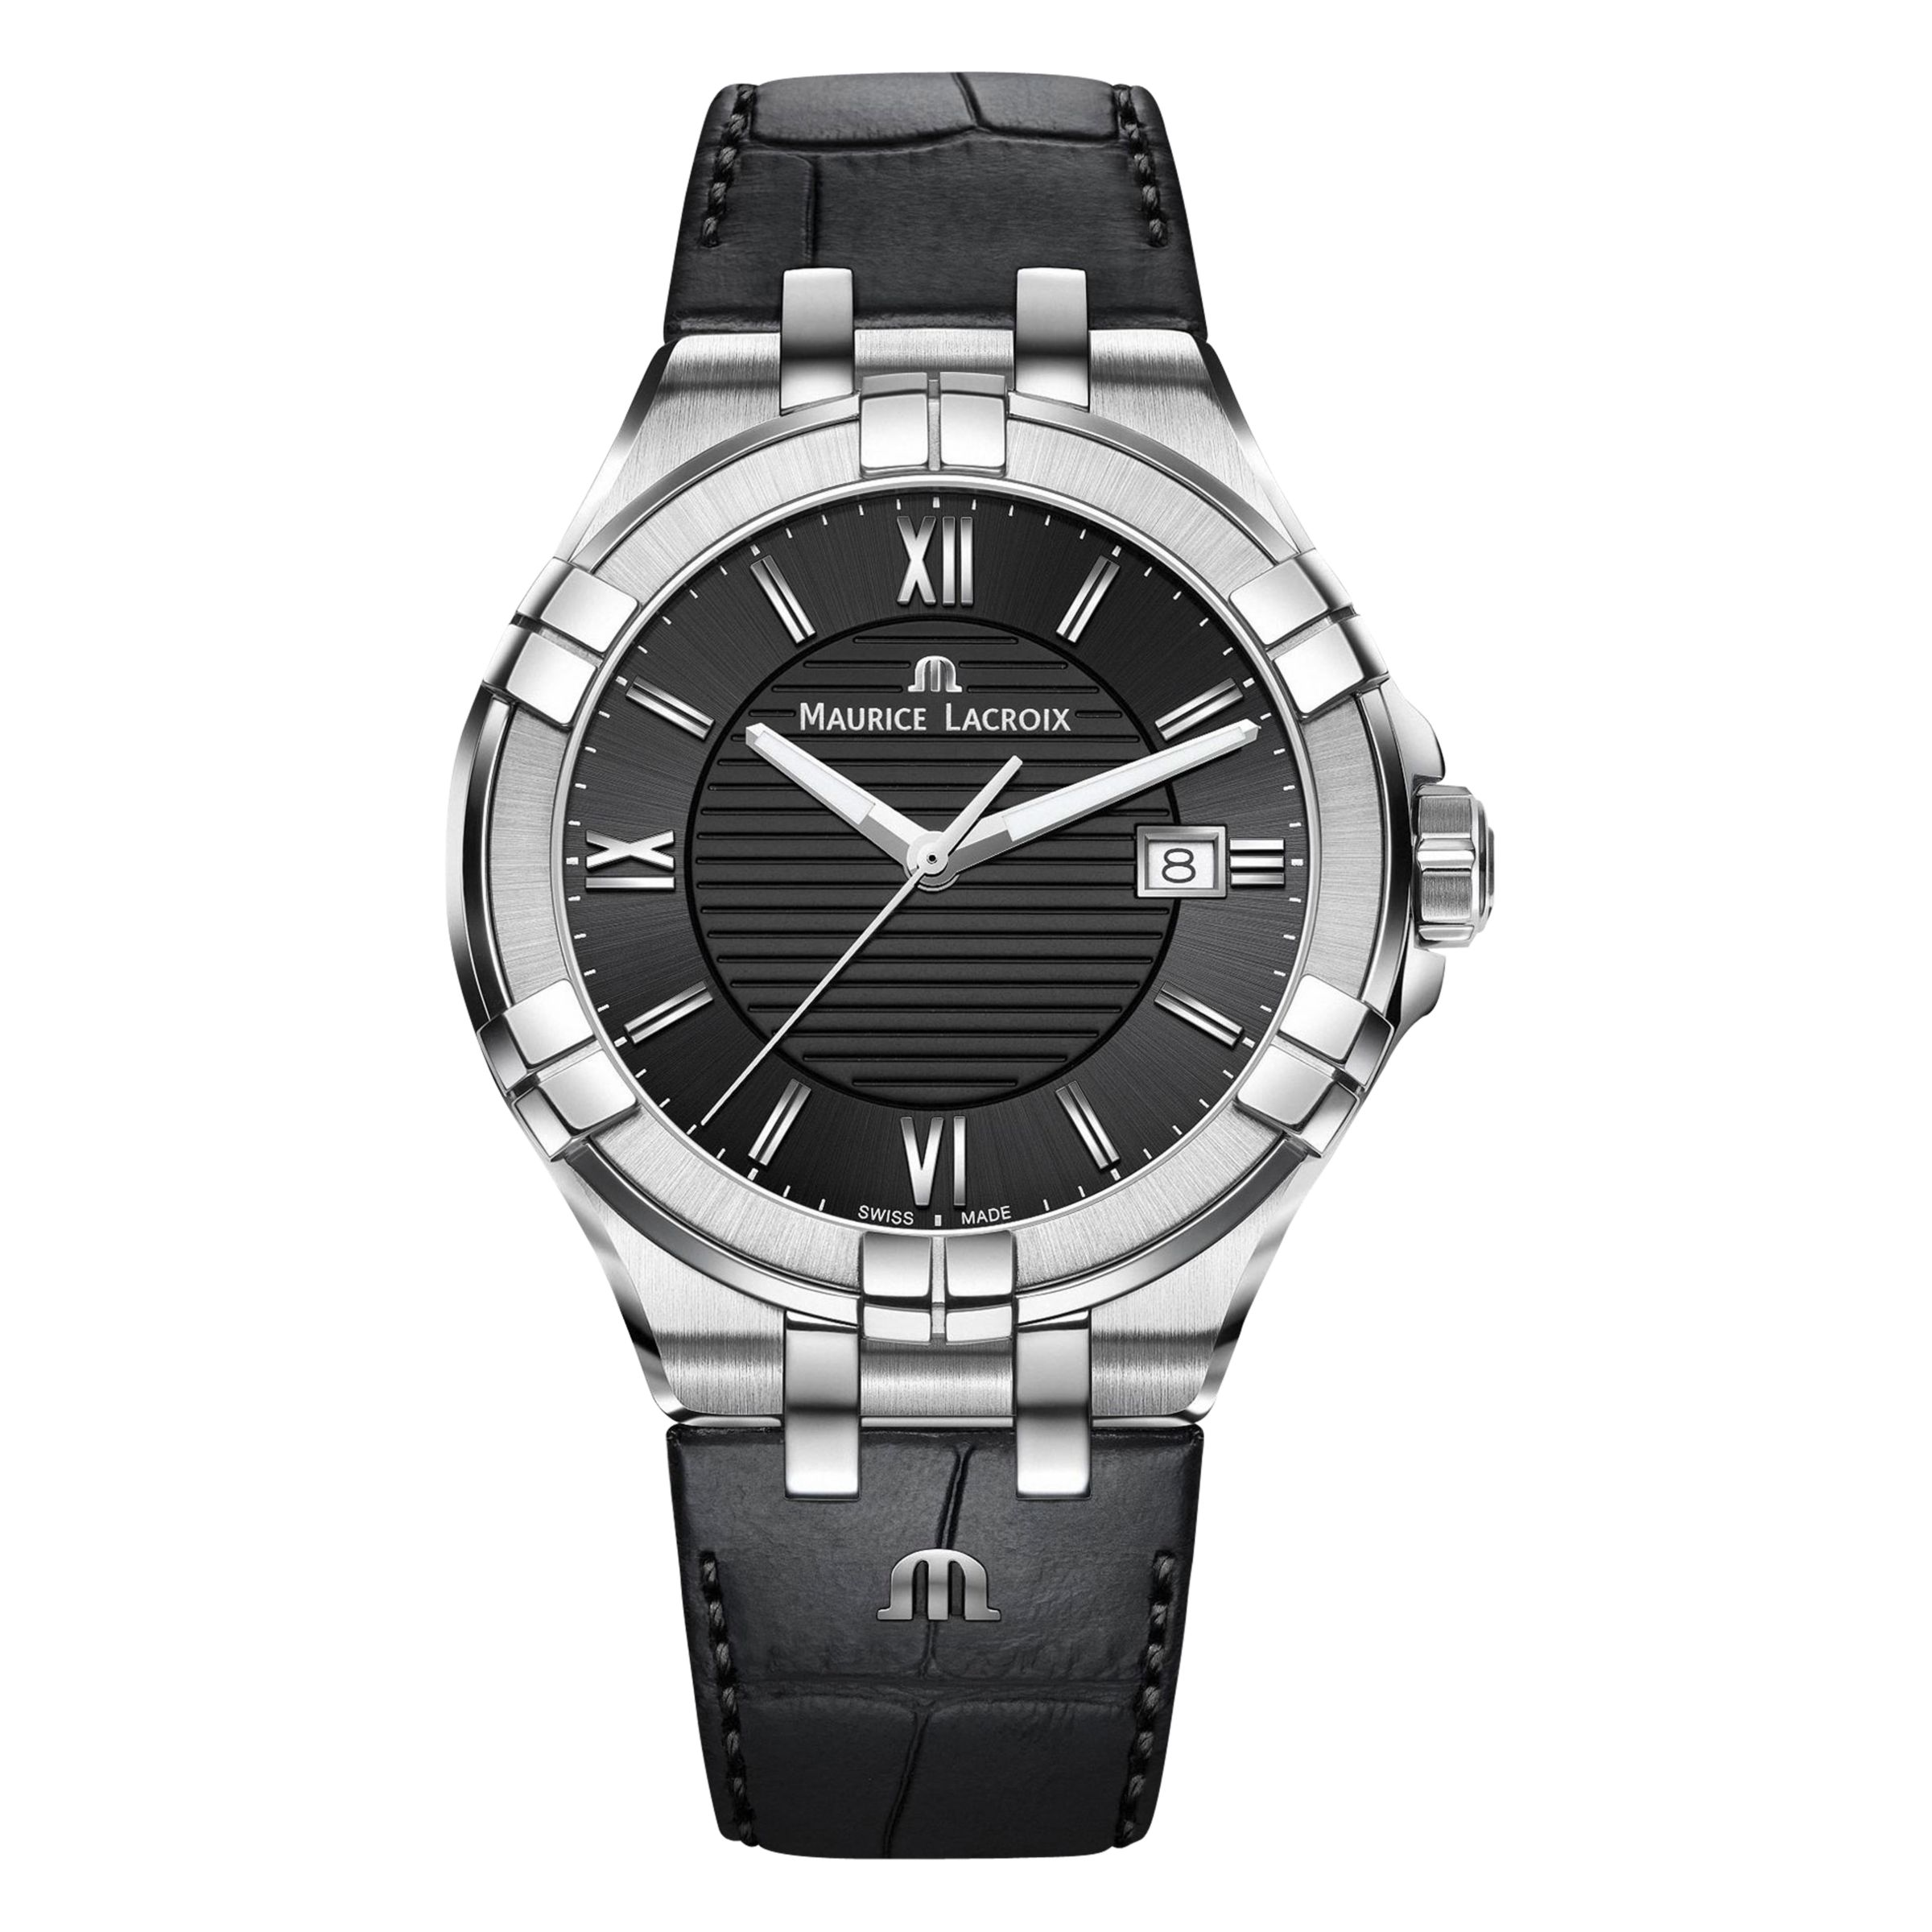 Maurice Lacroix Maurice Lacroix AI1008-SS001-330-1 Men's Aikon Date Leather Strap Watch, Black